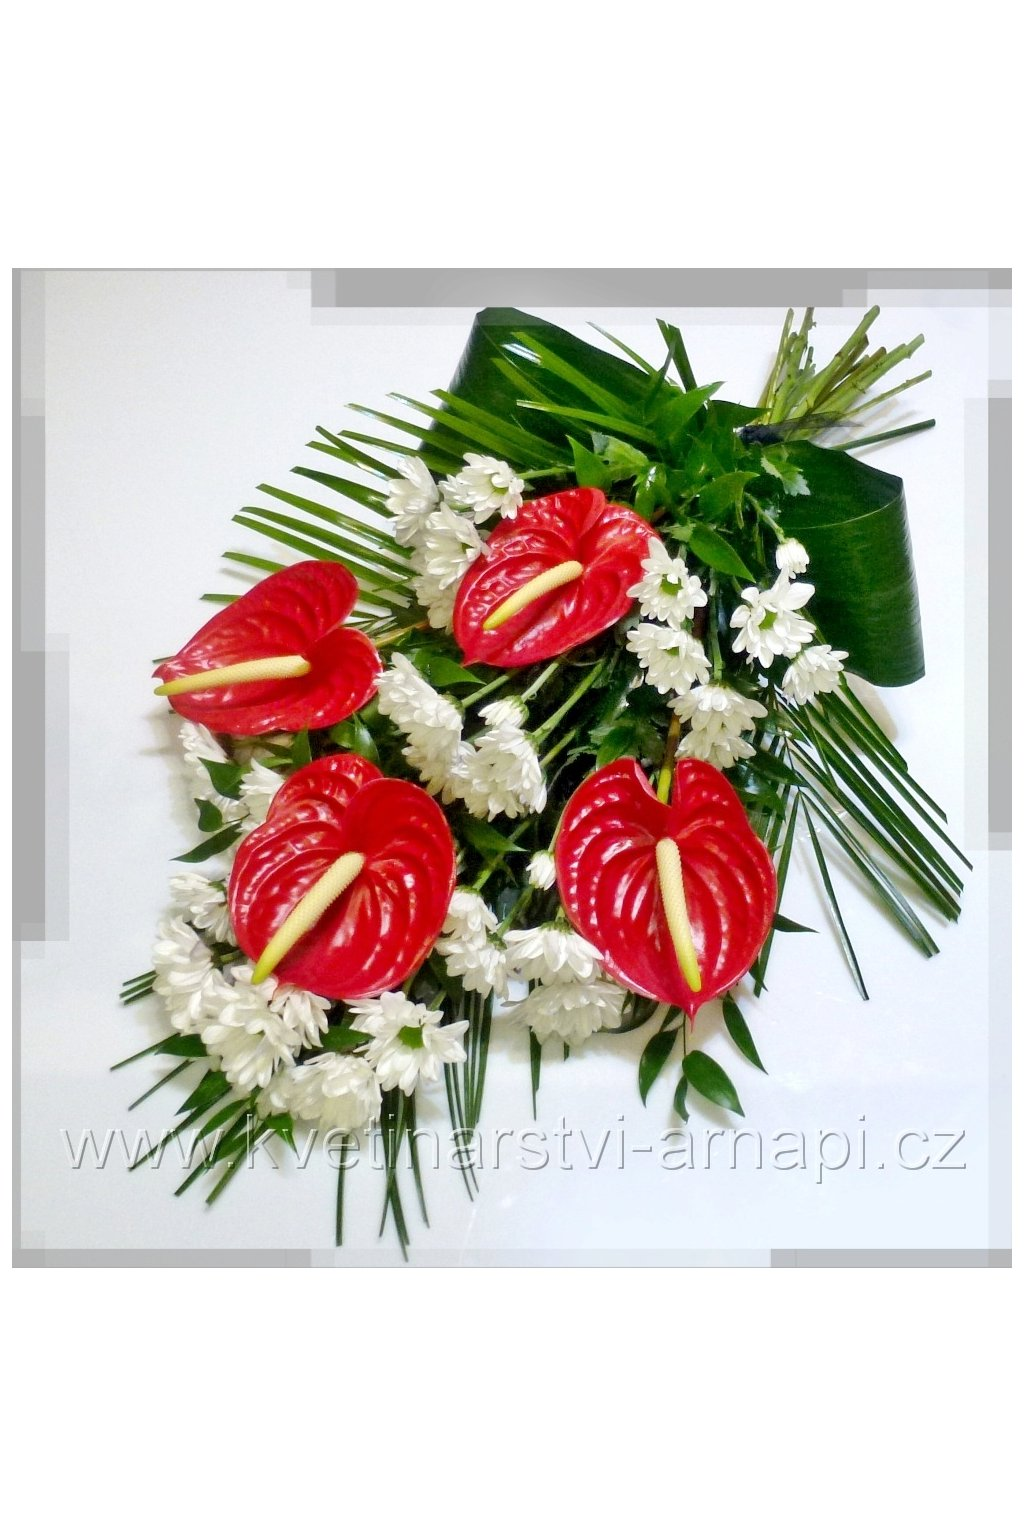 smutecni kytice vazana se stuhou kvetinarstvi arnapi